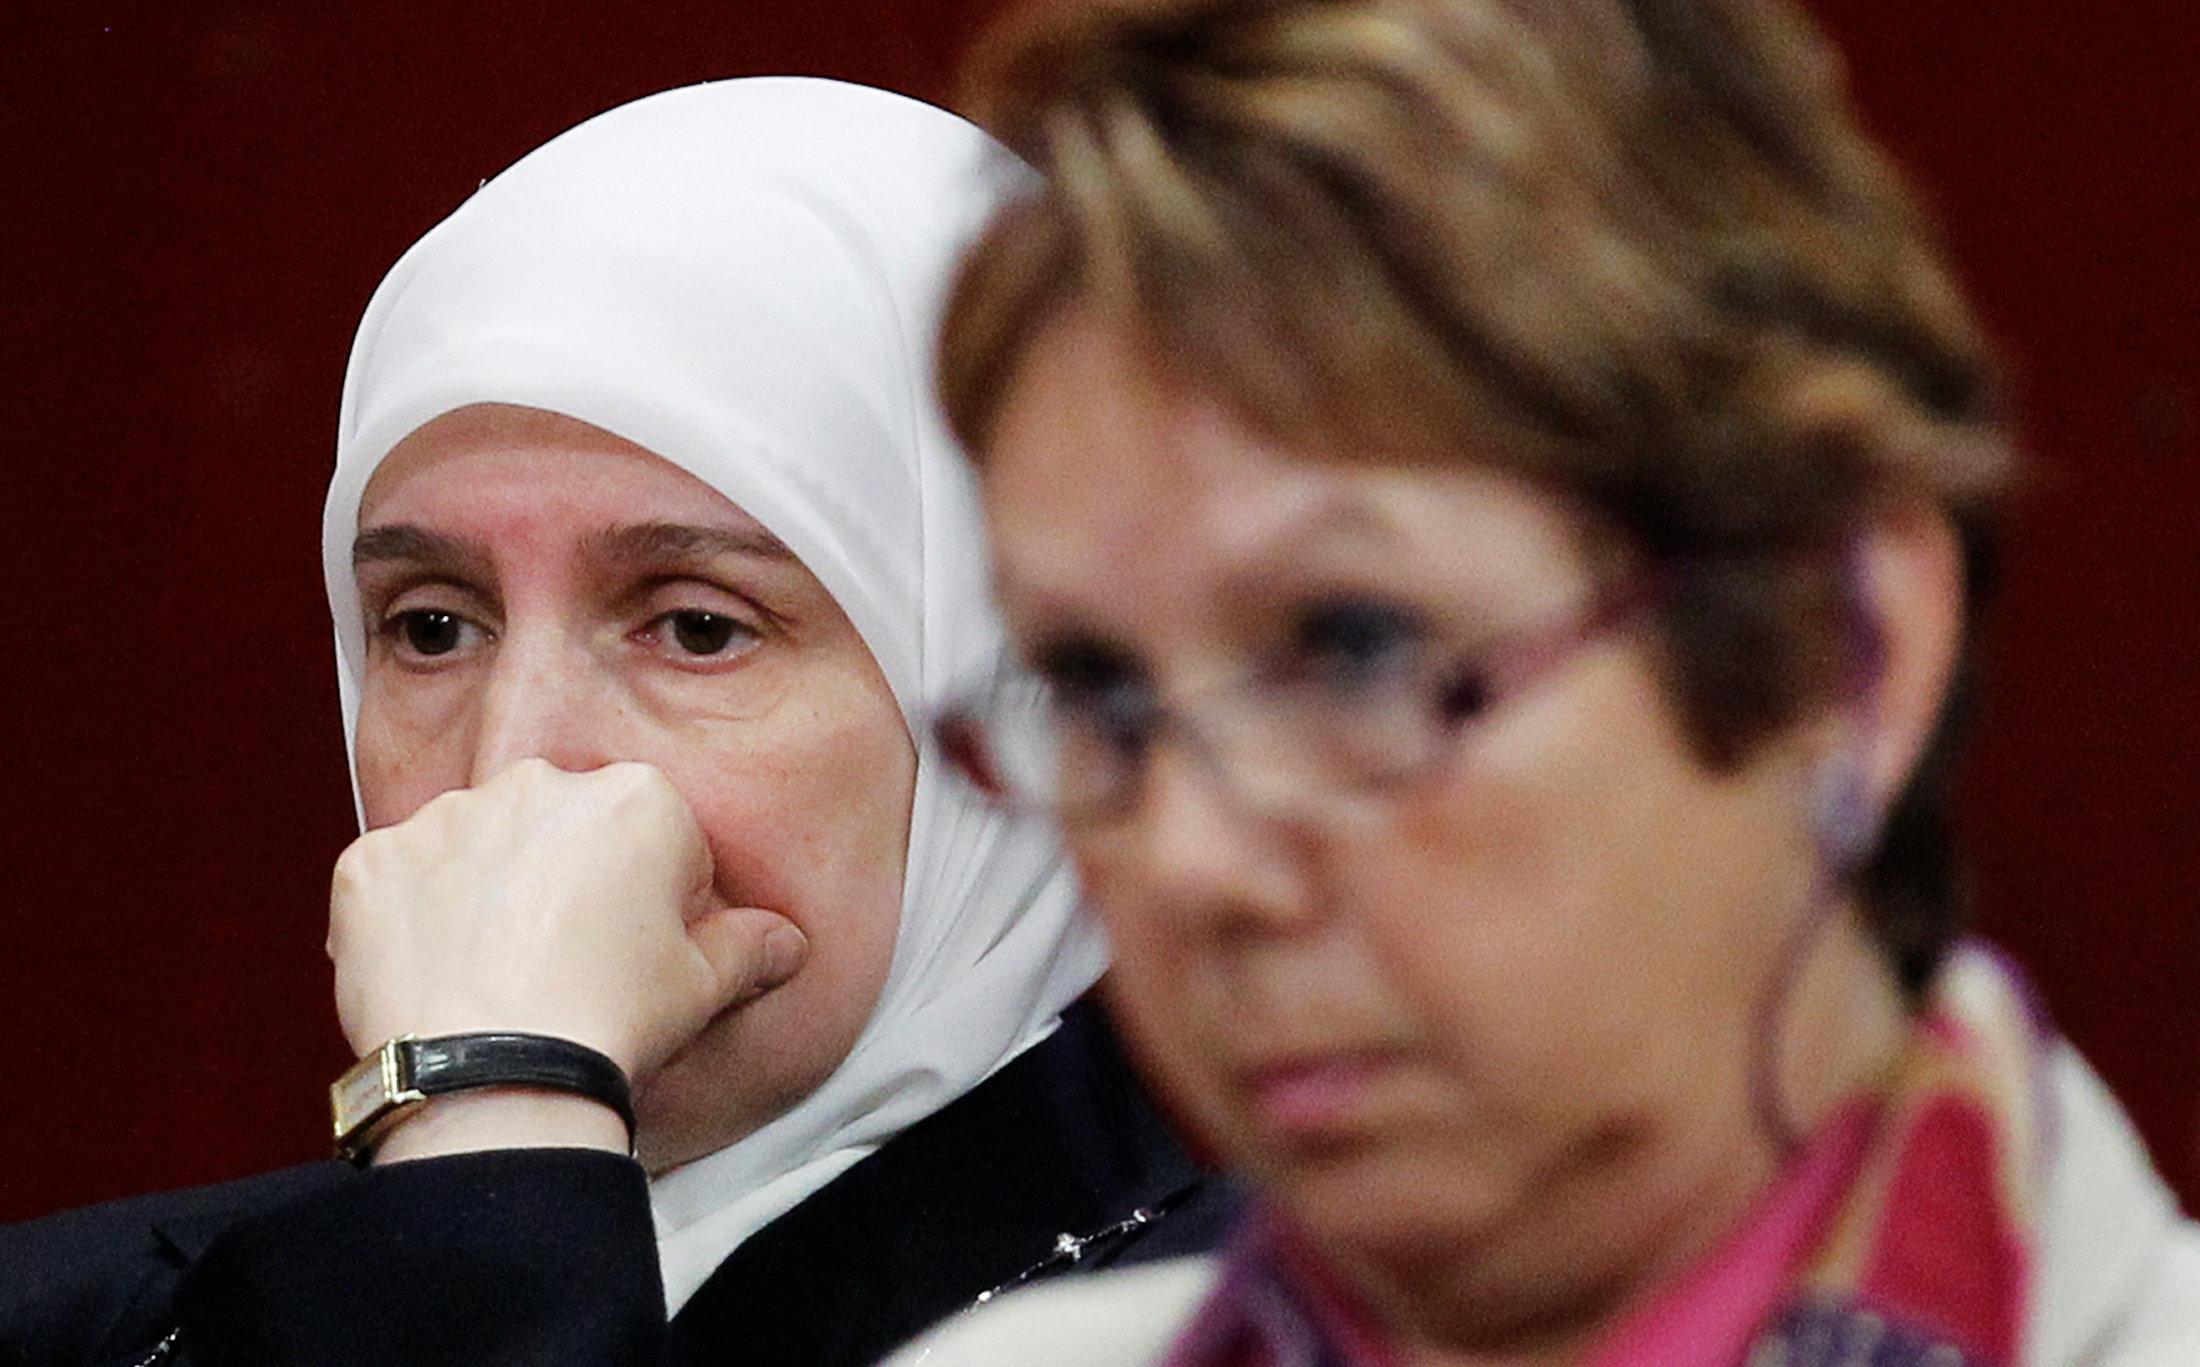 Canadian groups seek to overturn Quebec ban on Muslim veil